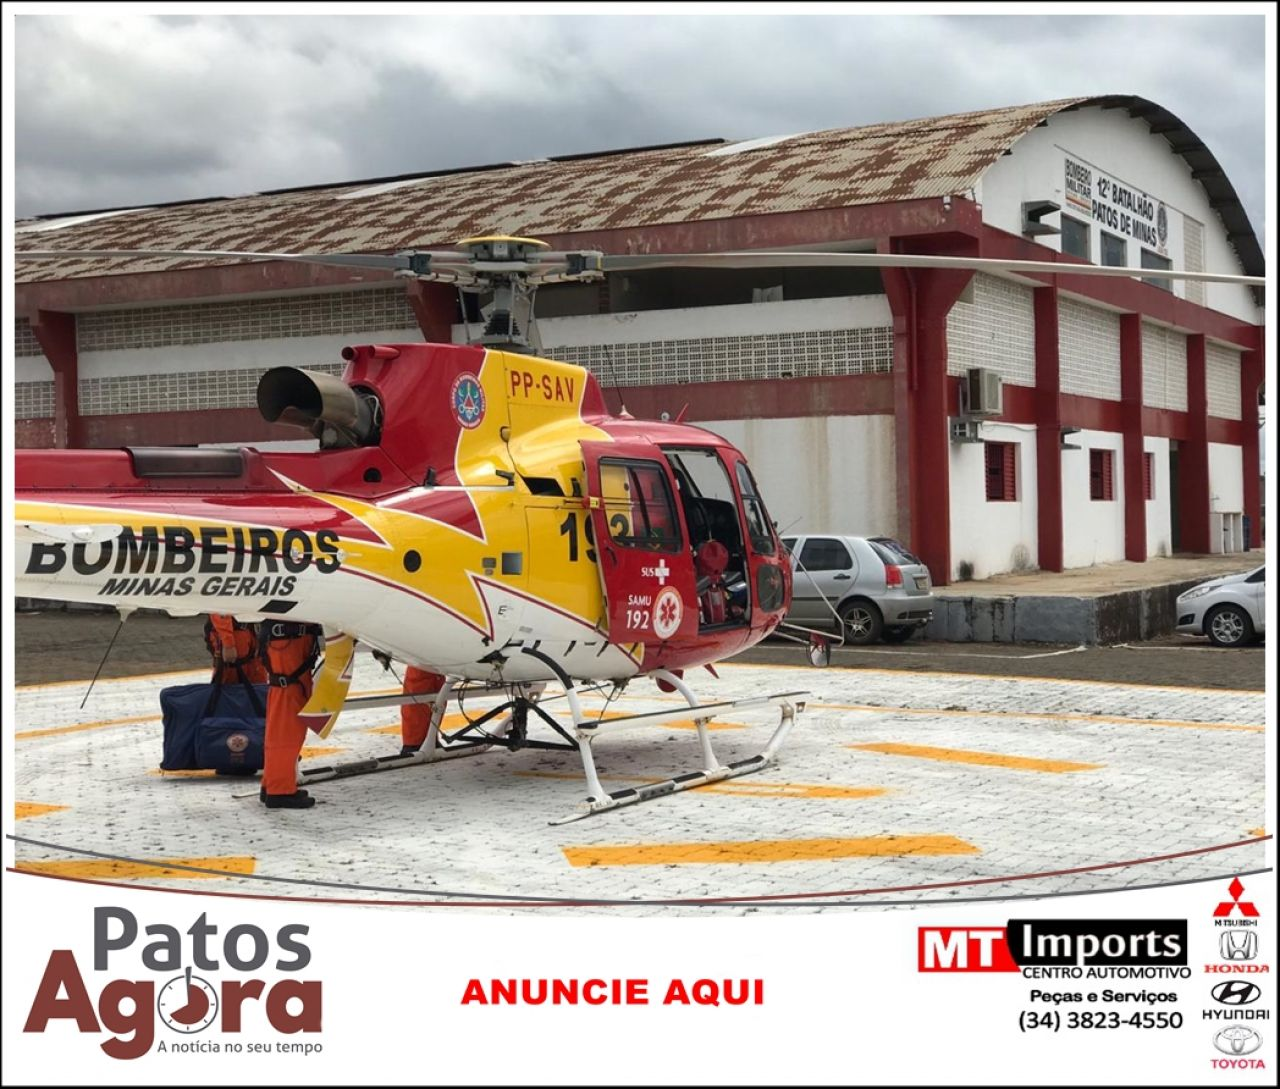 Paciente de Patos de Minas que sofreu infarto é transferido no helicóptero do Corpo de Bombeiros